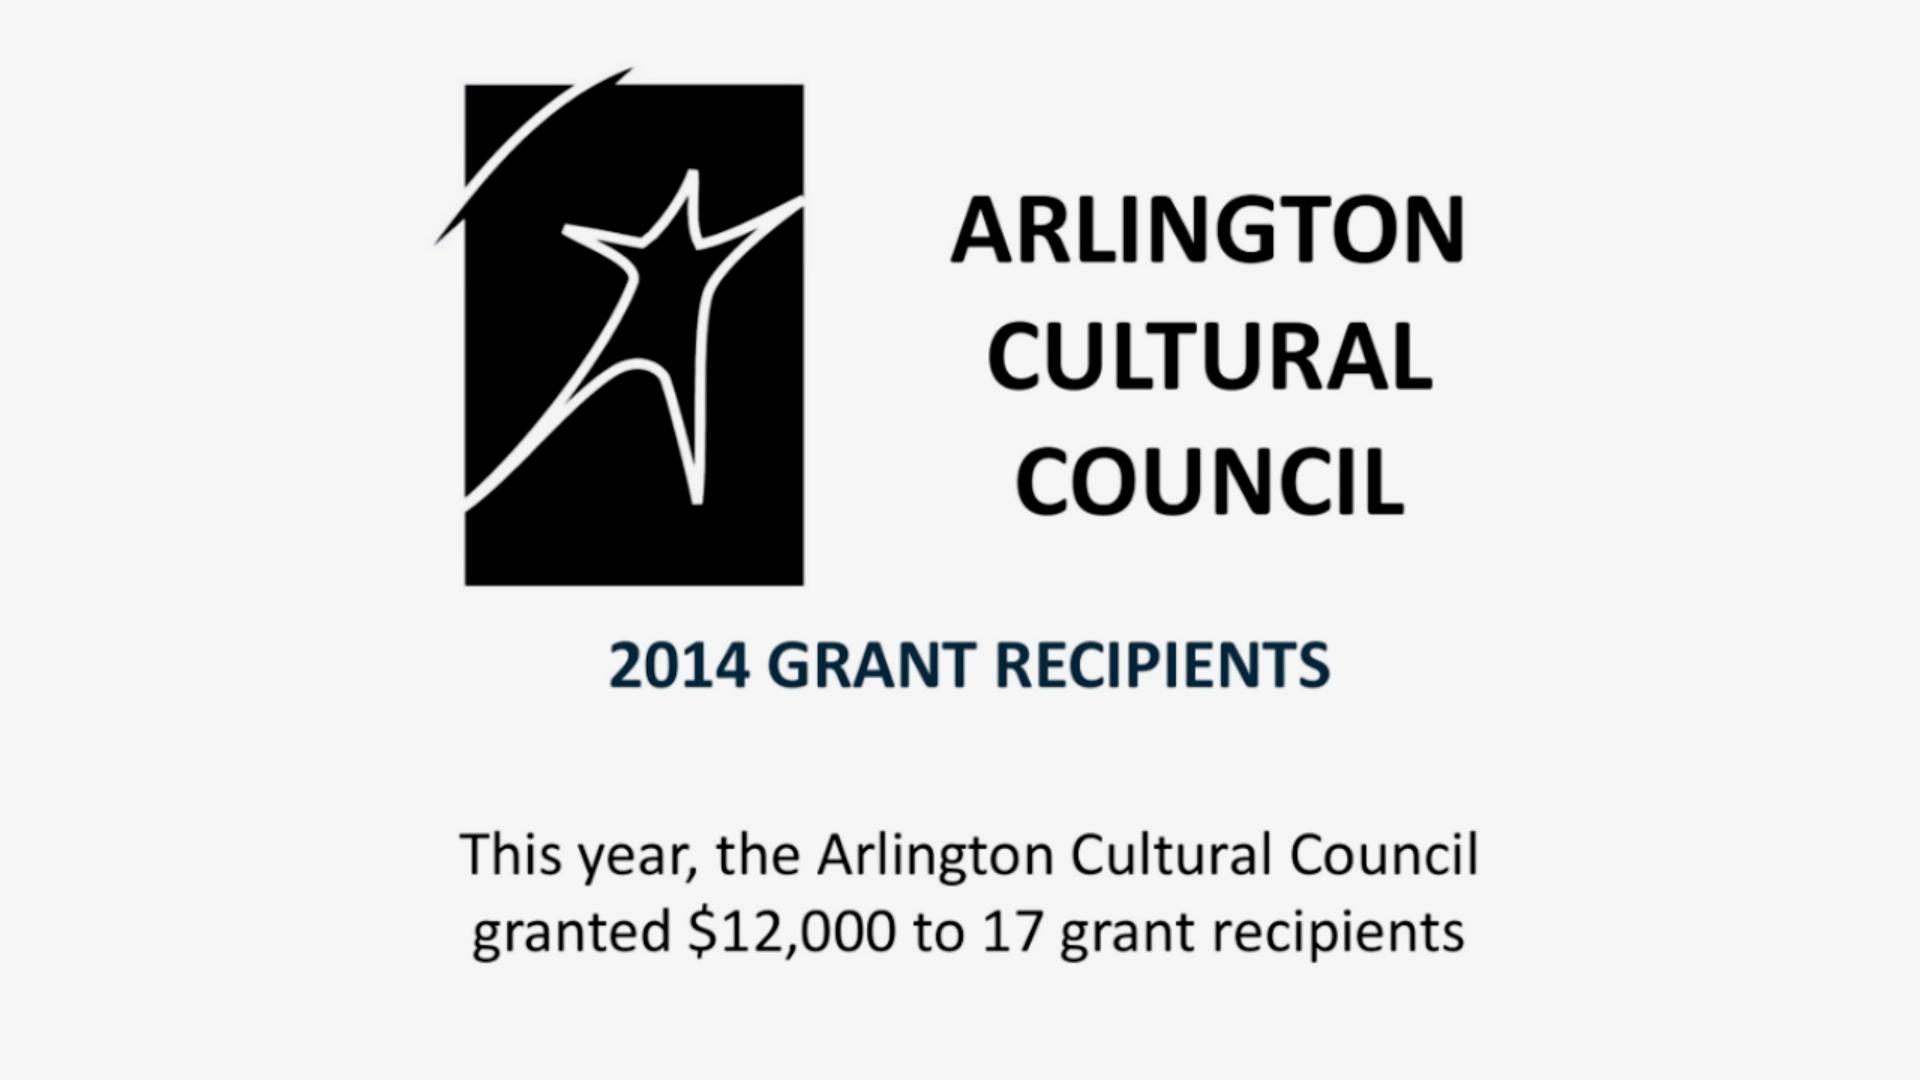 Arlington Cultural Council Awards 2014